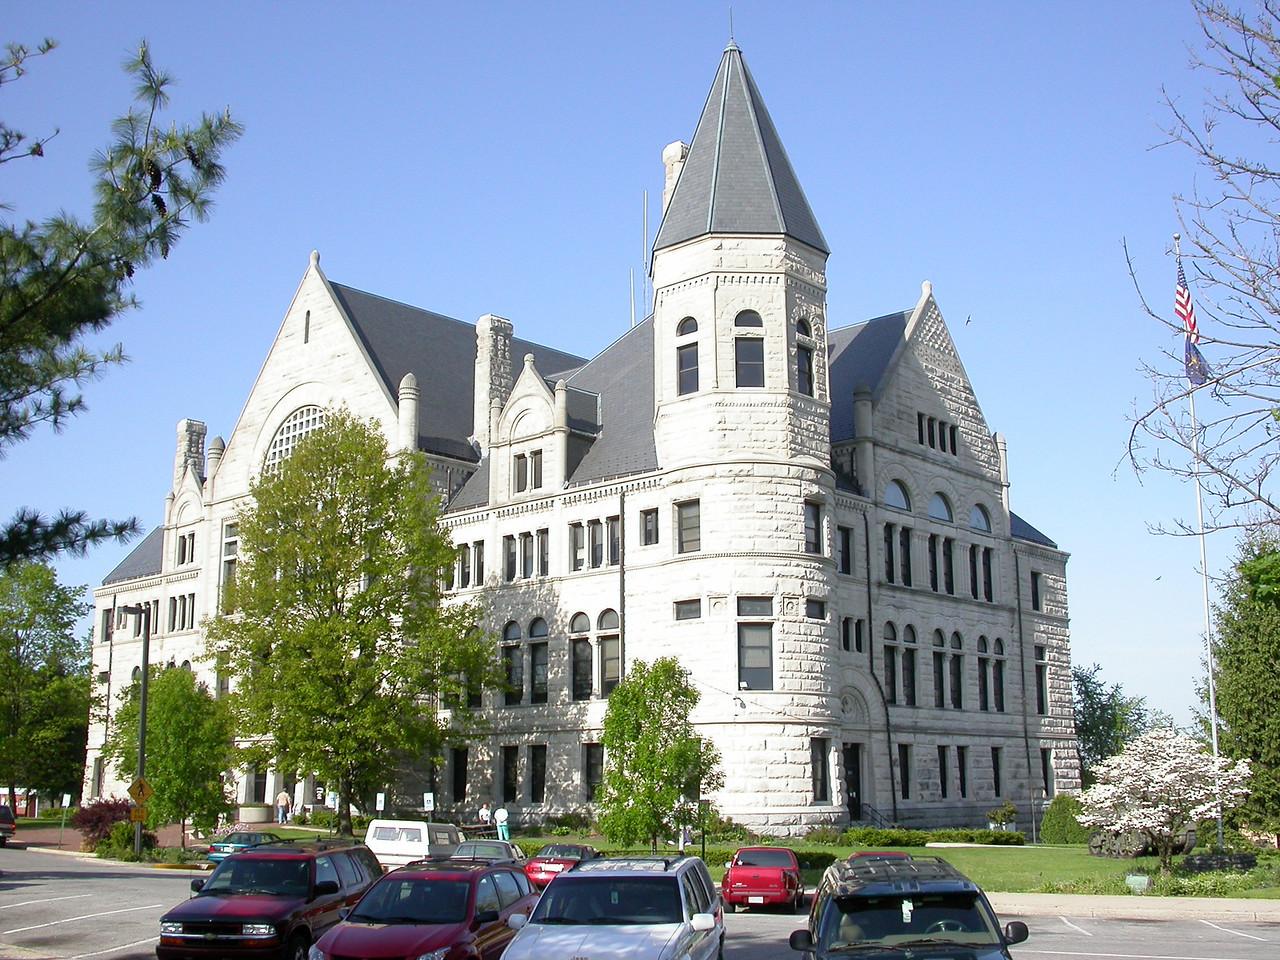 Wayne County Courthouse, Richmond, Indiana, May 2004.